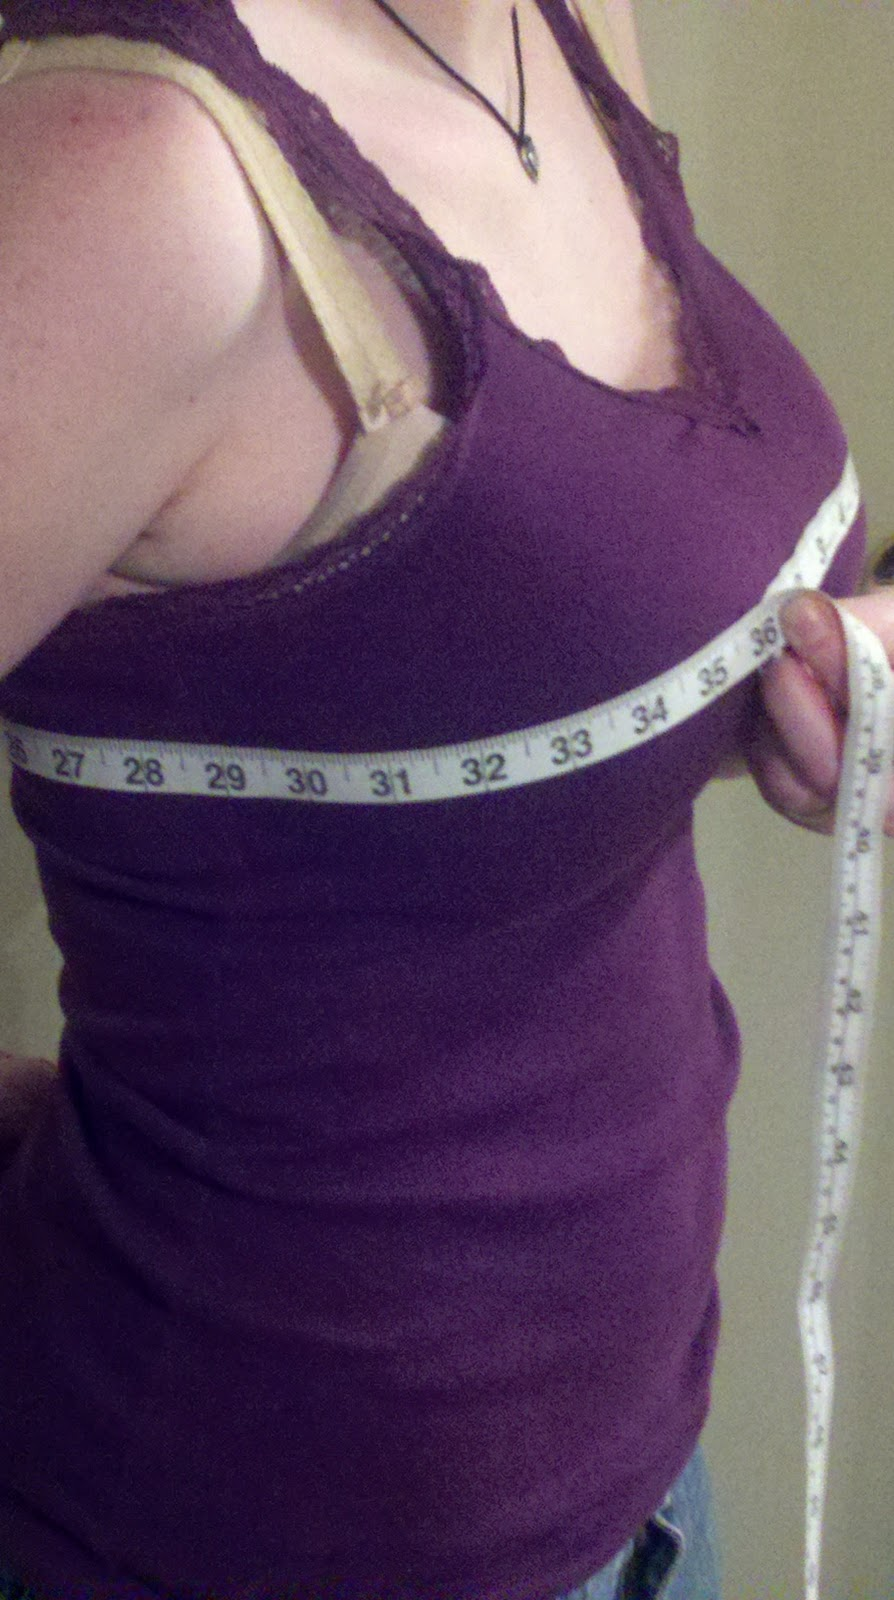 7fd7286415602 Boosaurus!  Bra Fitting  How to Measure Yourself